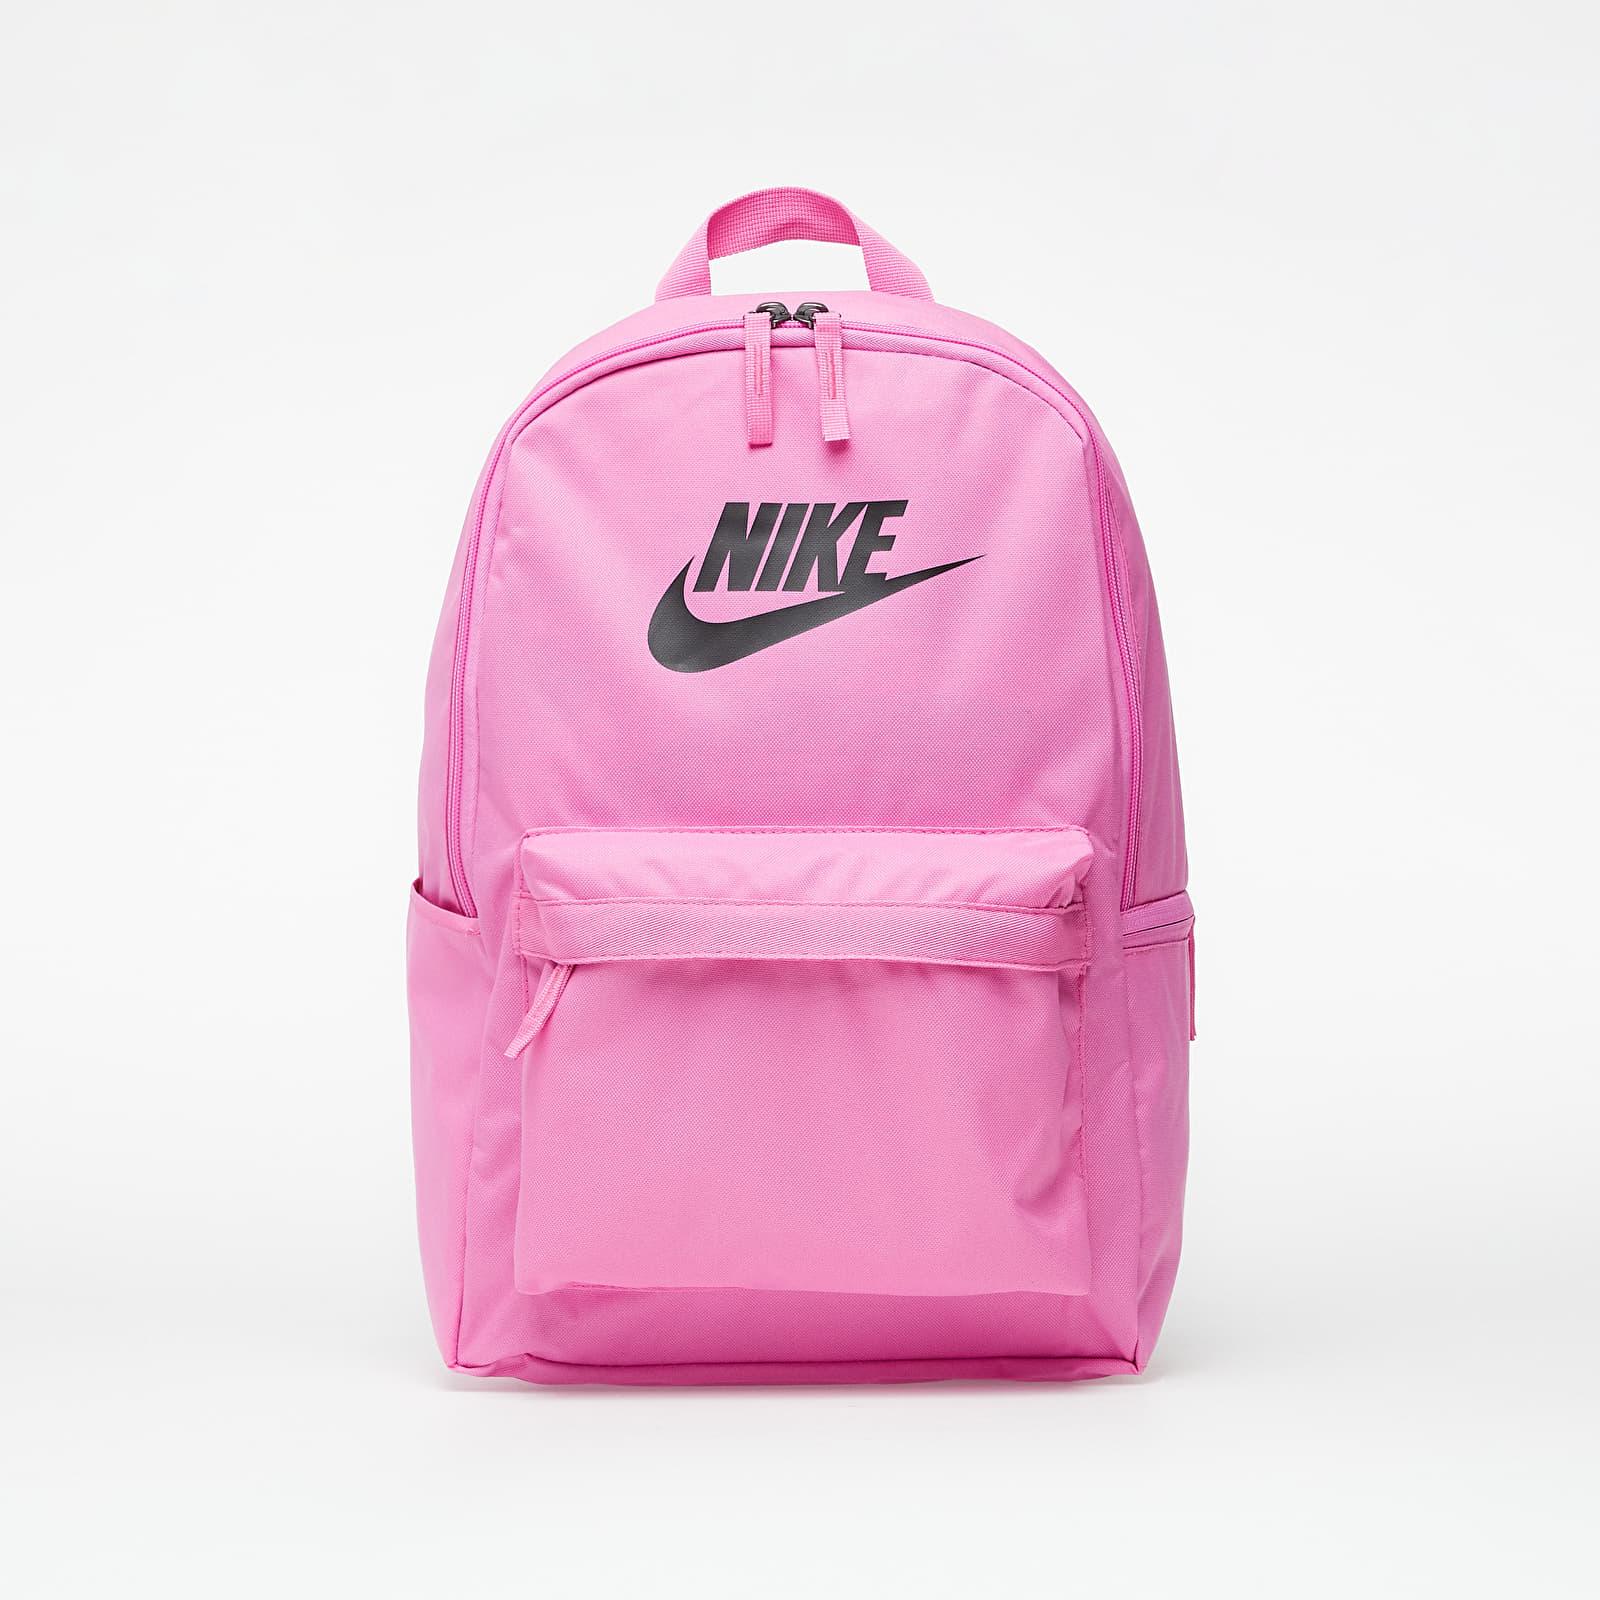 Ruksaci Nike Heritage 2.0 Backpack Pink